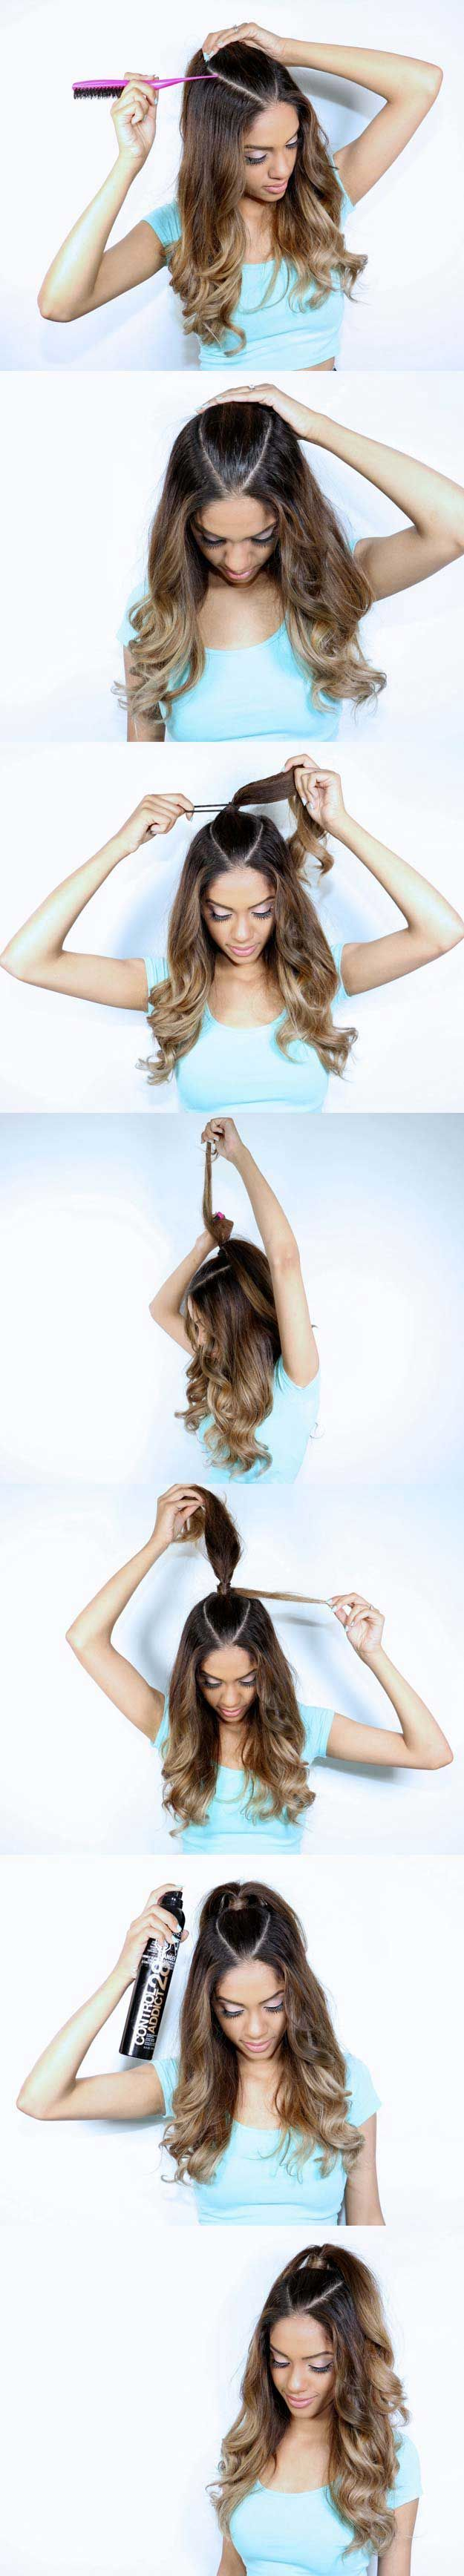 Amazing Half Up-Half Down Hairstyles For Long Hair - Ariana Grande Inspired Hair...